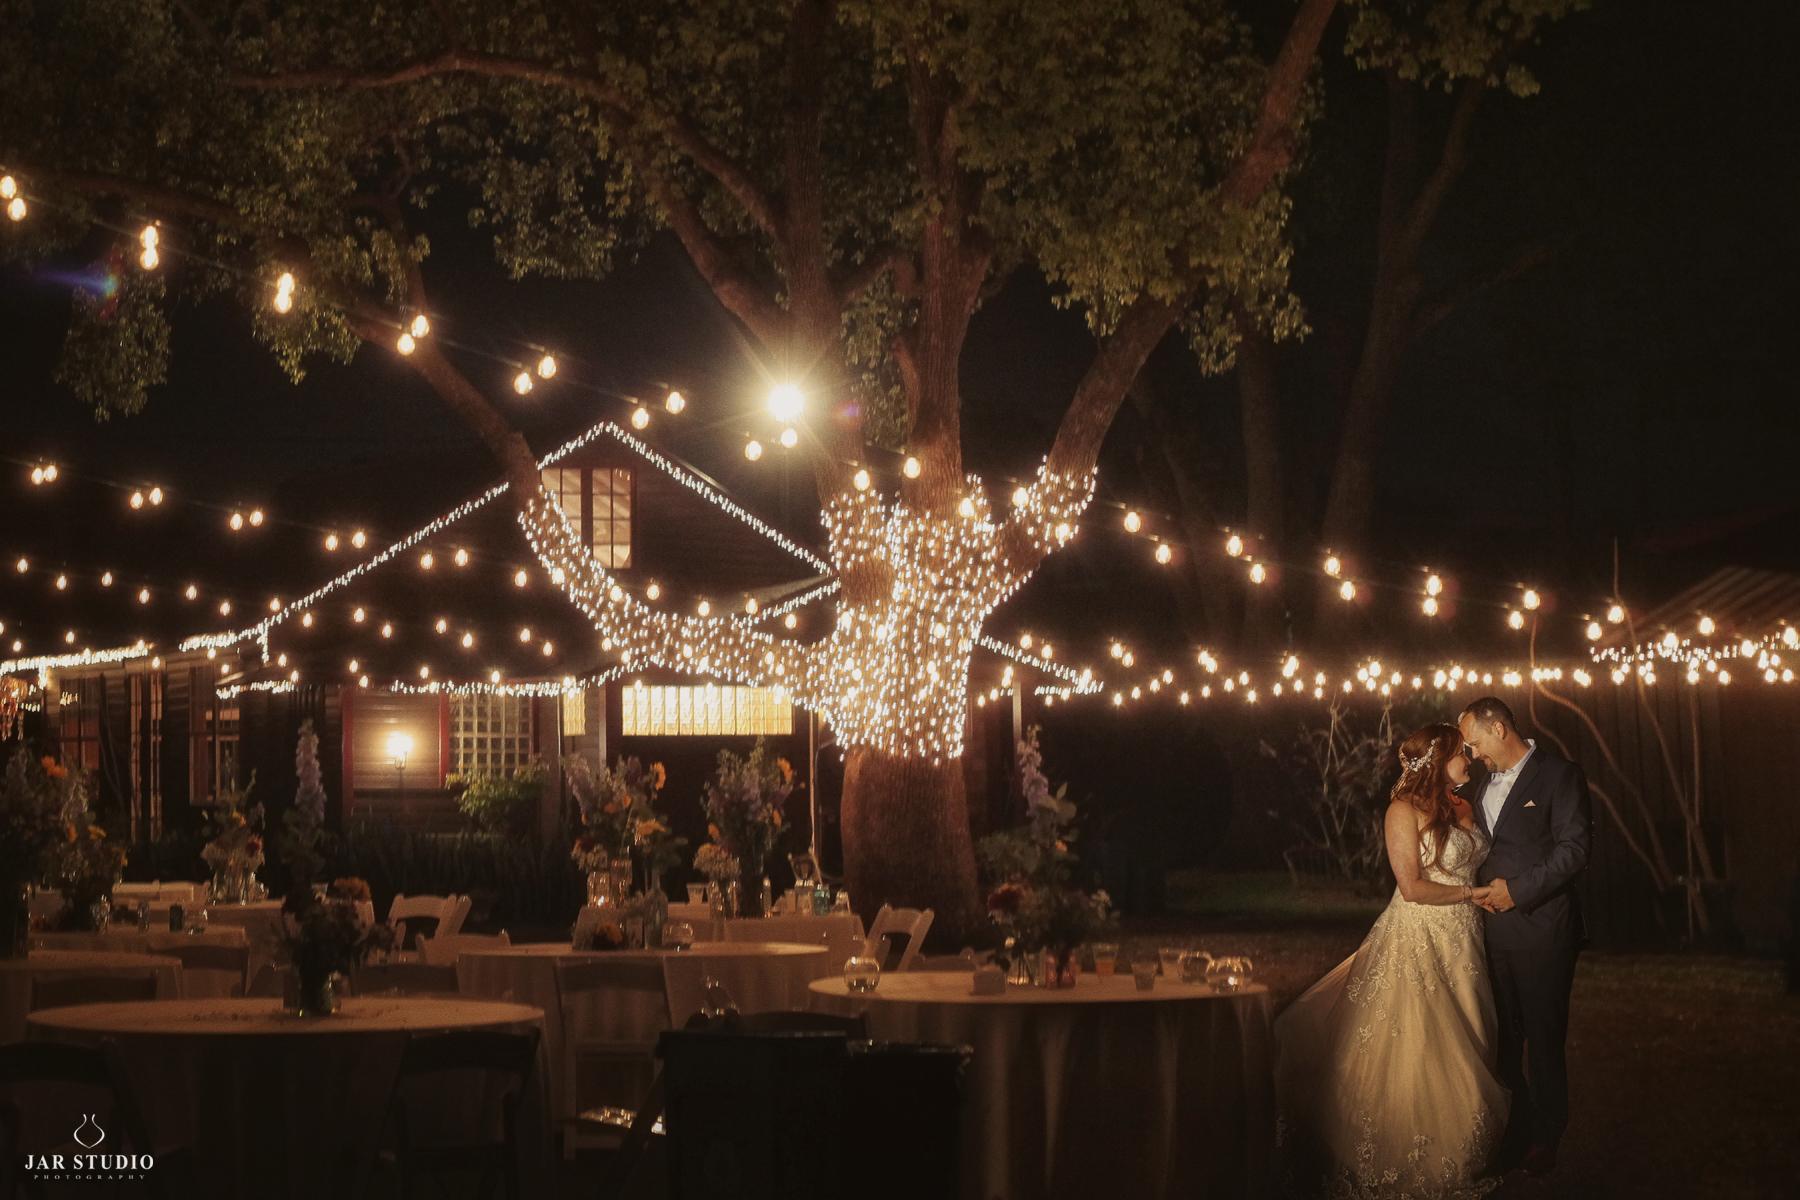 39-reception-decor-warm-romantic-jarstudio.JPG